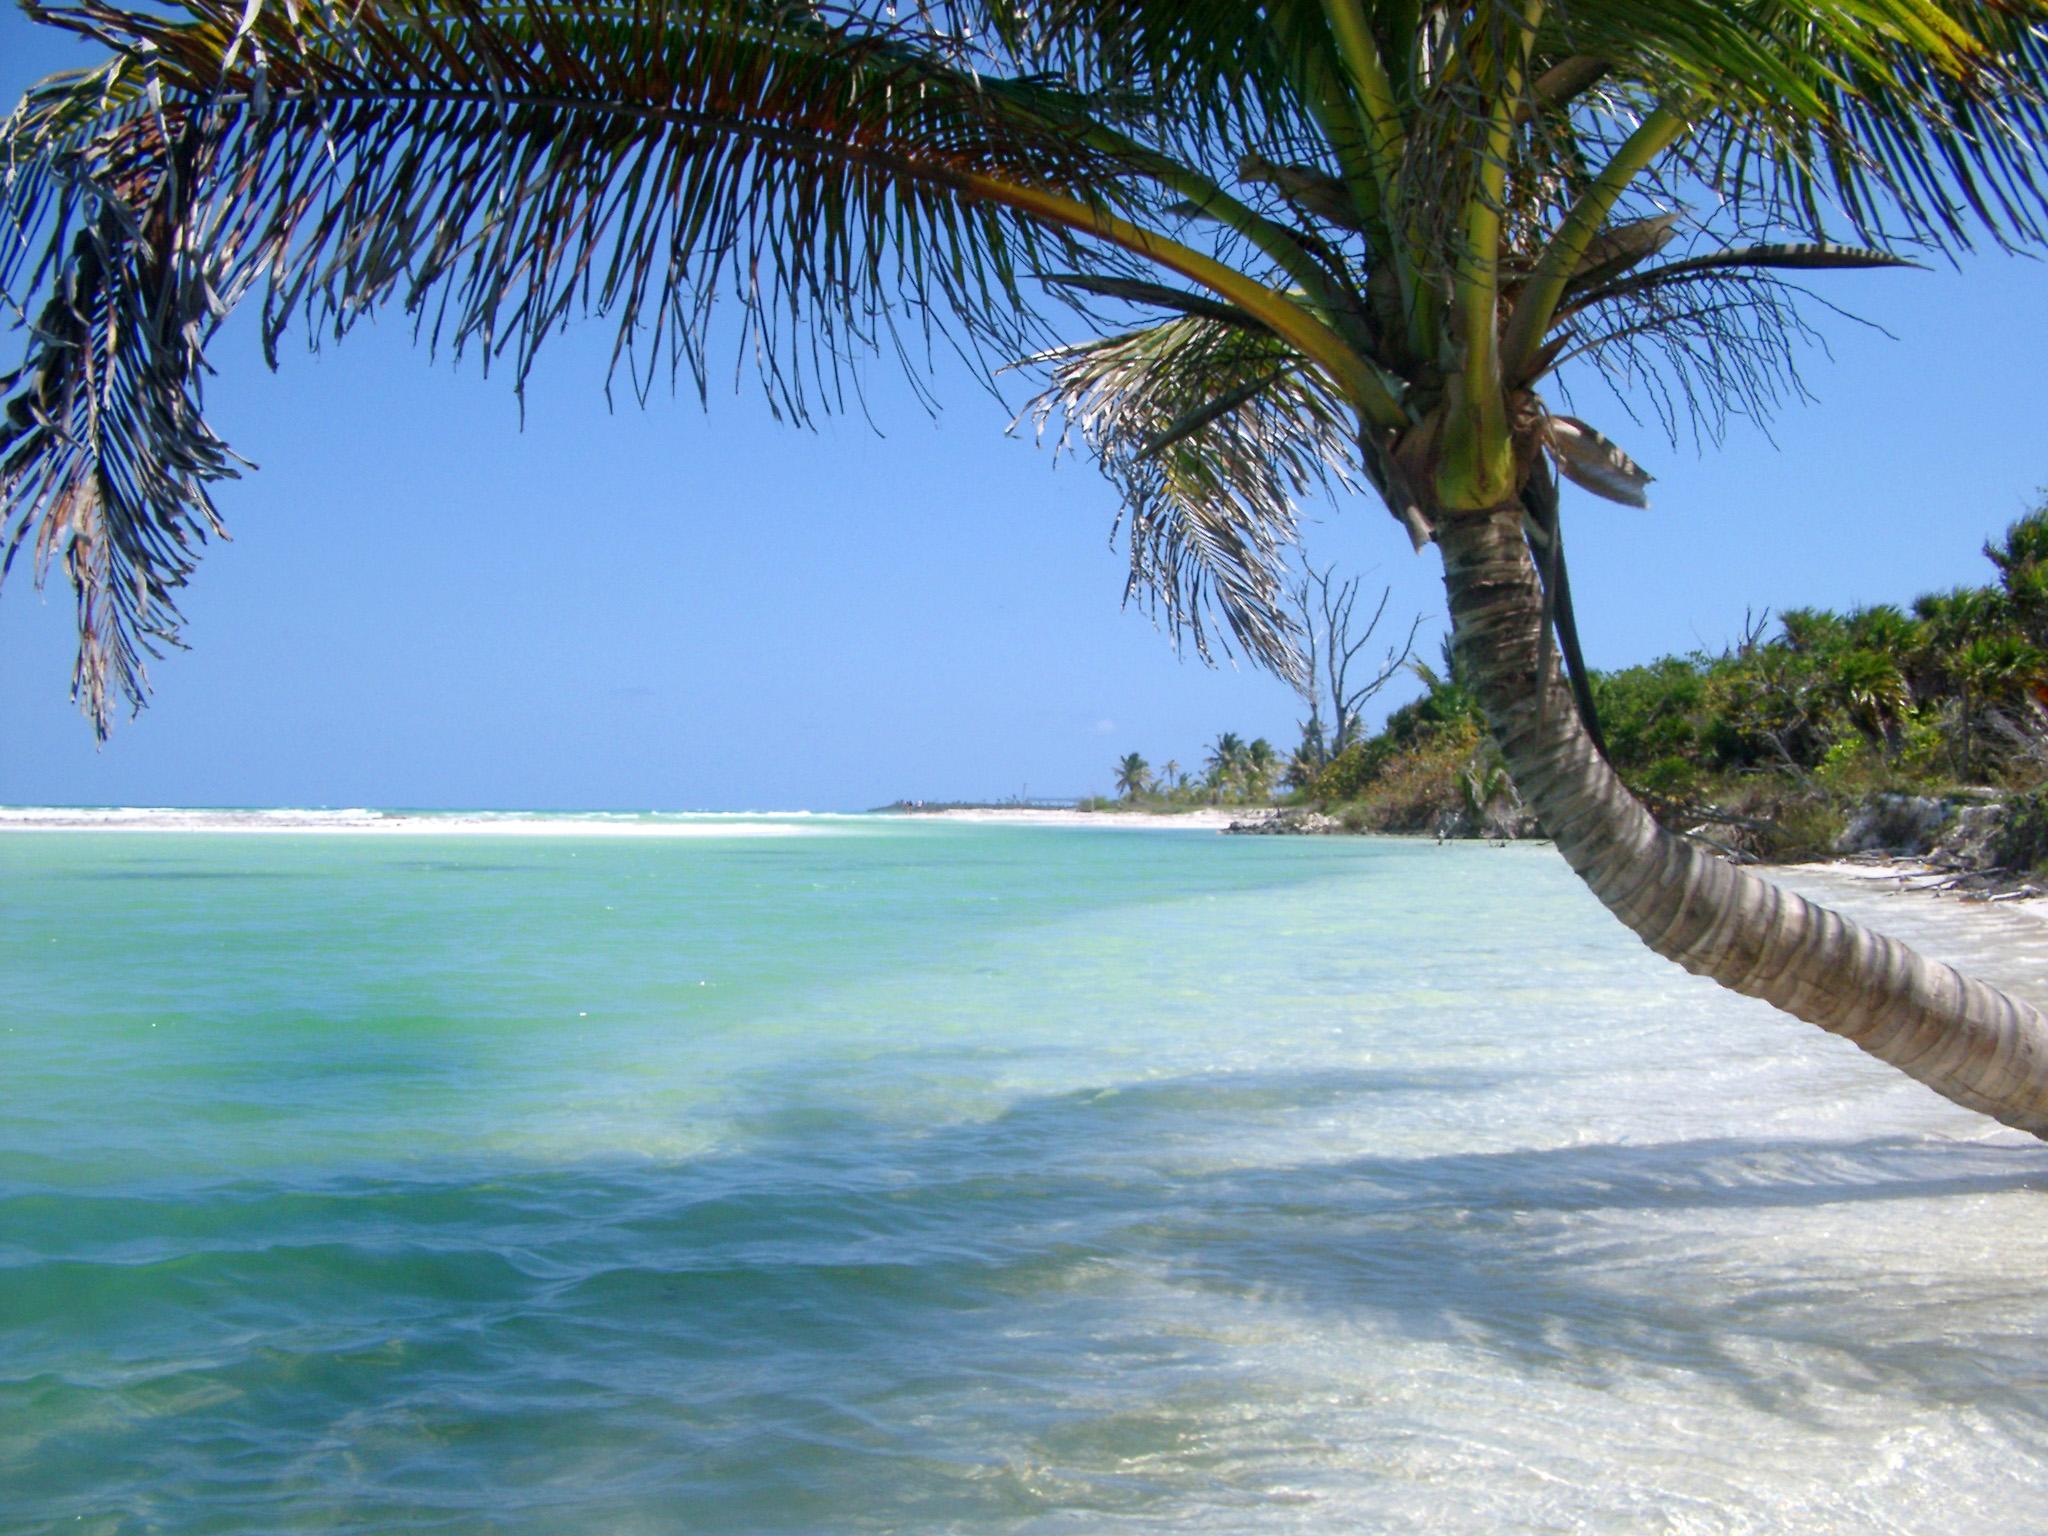 free image of idyllic tropical bech and palm tree